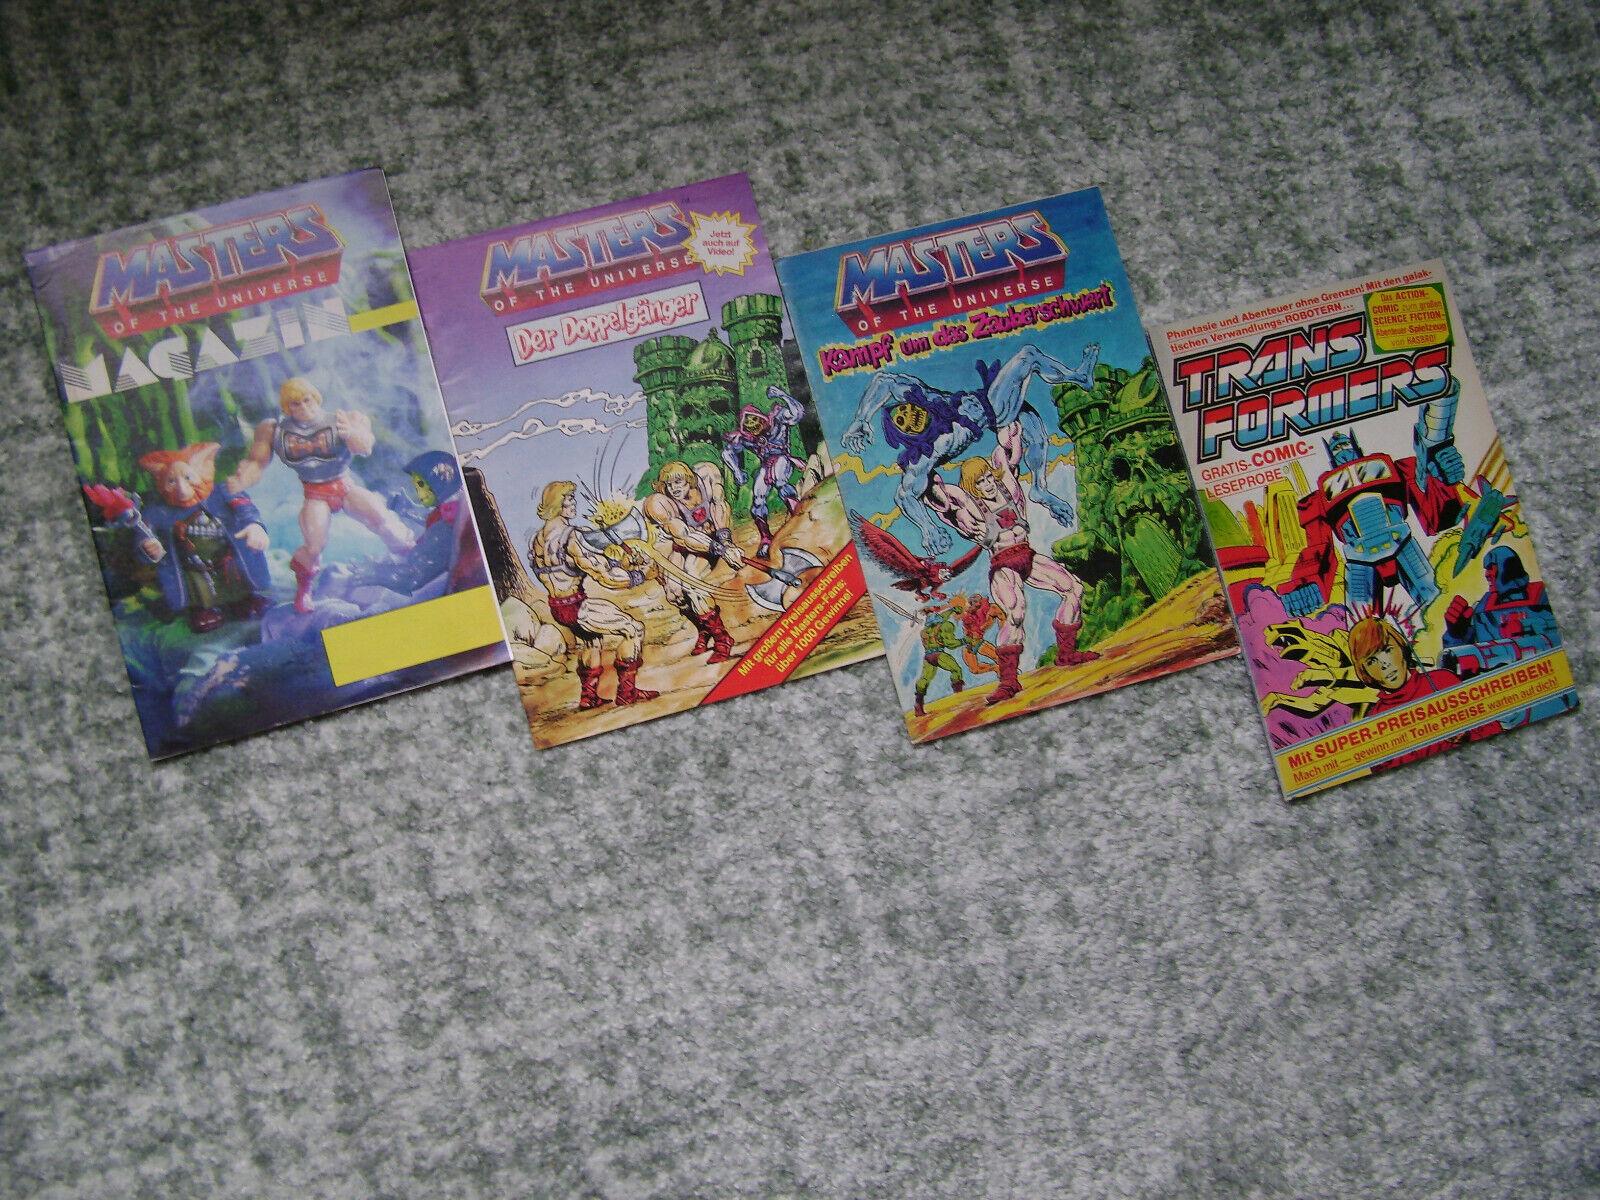 3 GERuomo MASTERS OF THE UNIVERSE & 1 TRANSFORMERS COMICS   MAGAZINES